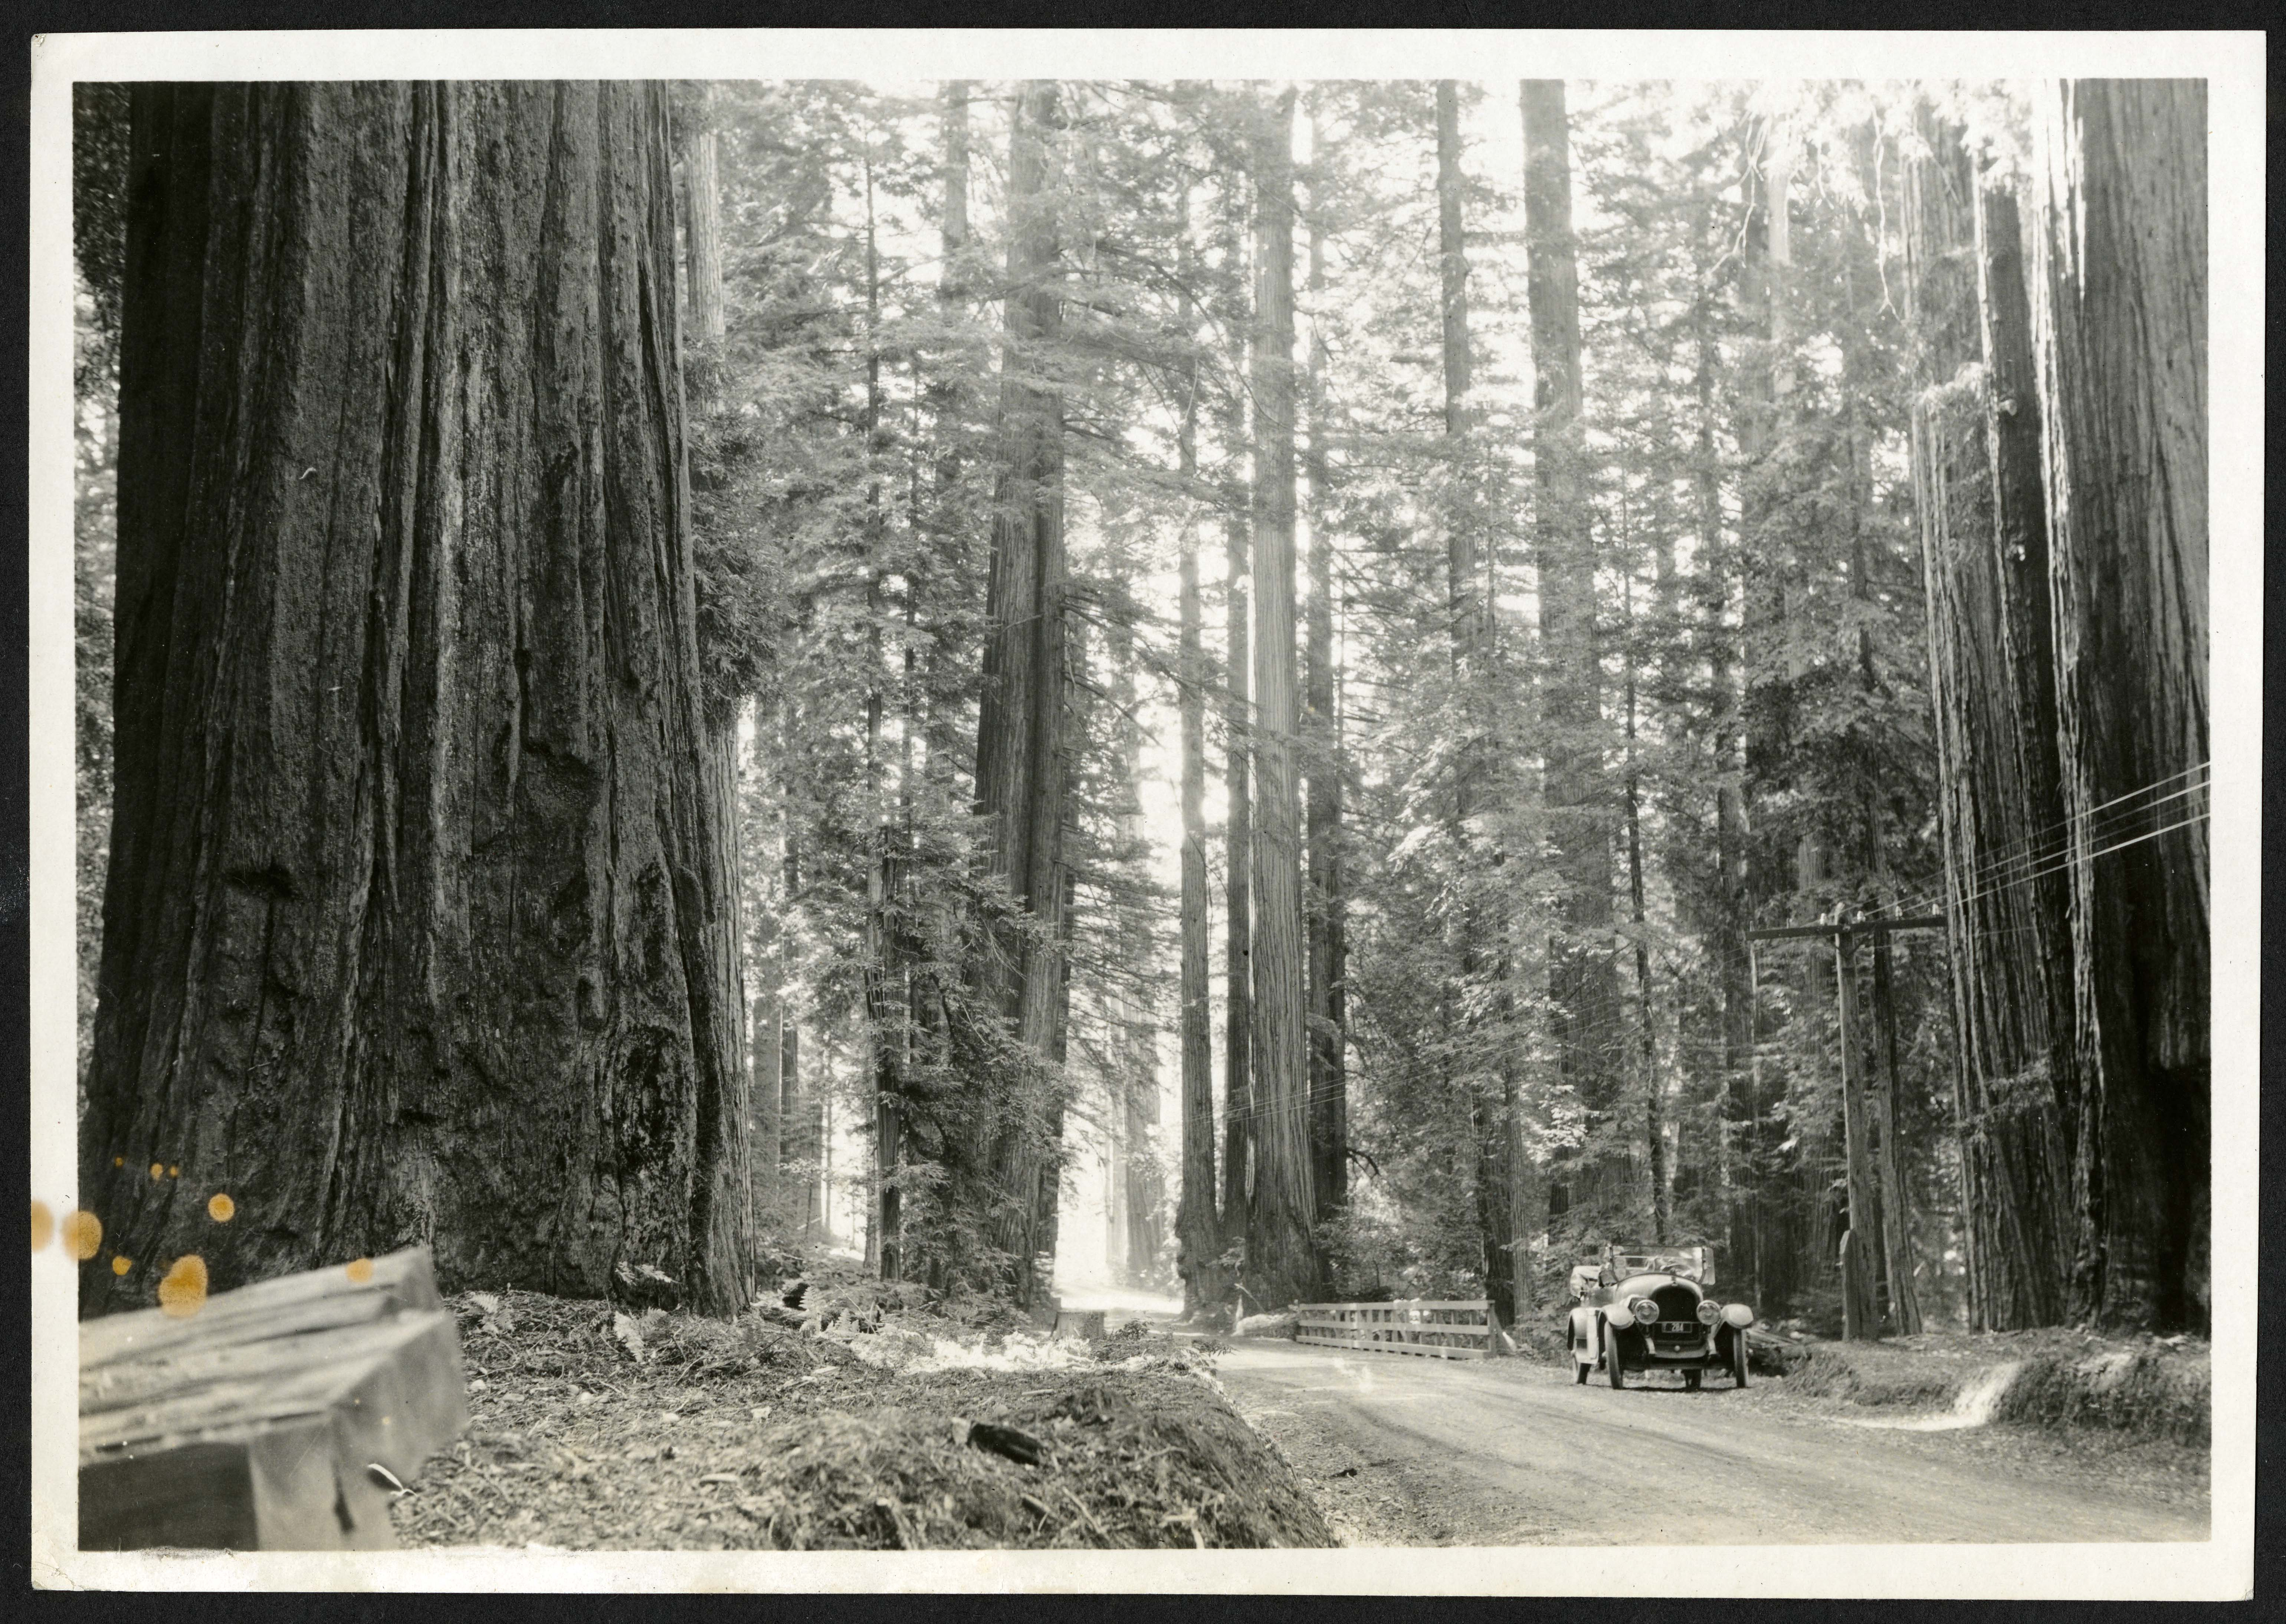 Scene in Bolling Memorial Redwood Grove, Humboldt County, California, 1921.